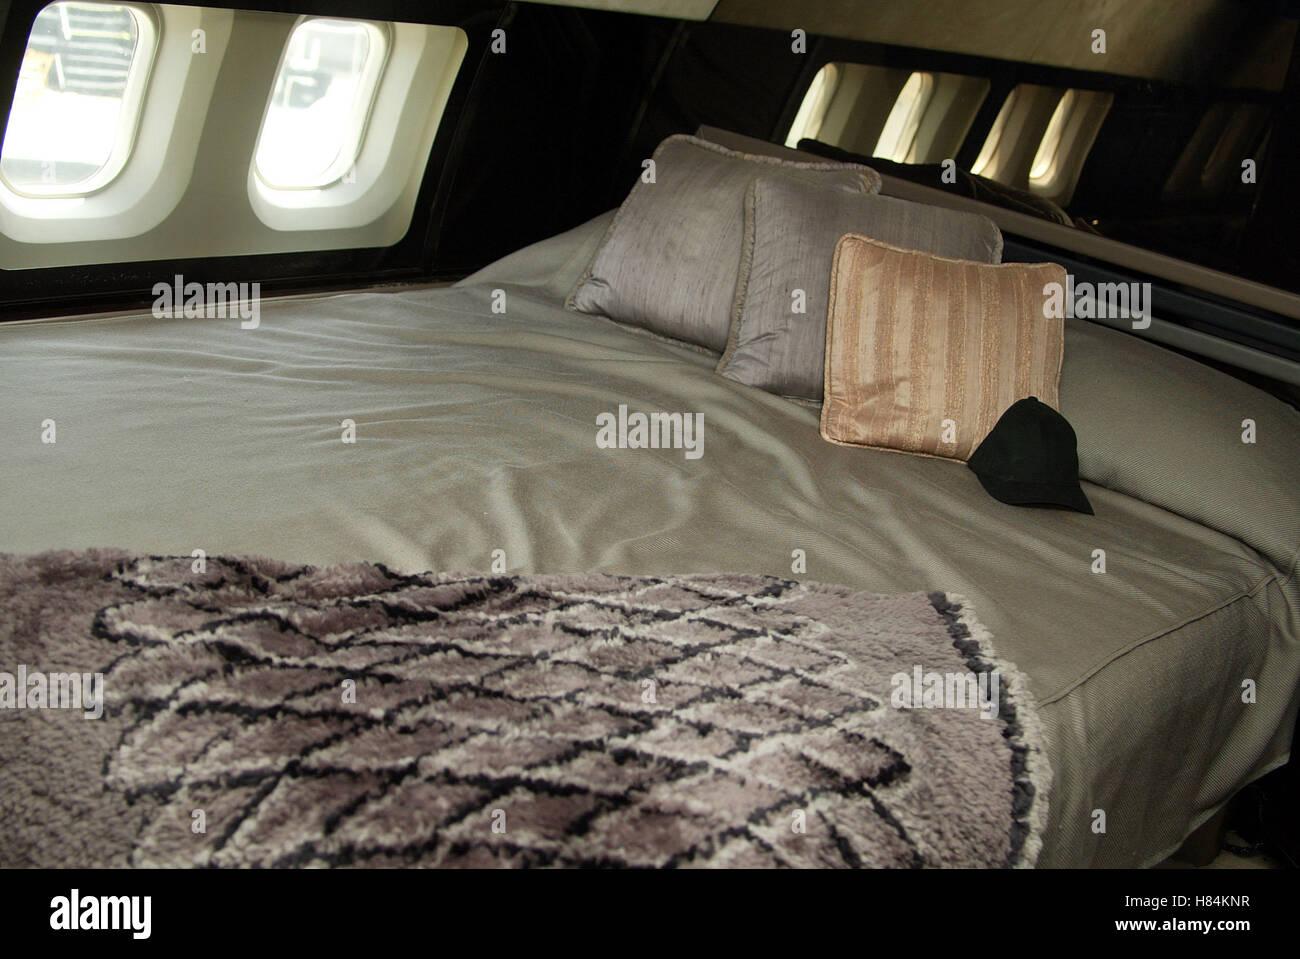 JOHN TRAVOLTA BED ON HIS JET QANTAS AMMASSADOR AT LARGE LOS ANGELES AIRPORT  [LAX]